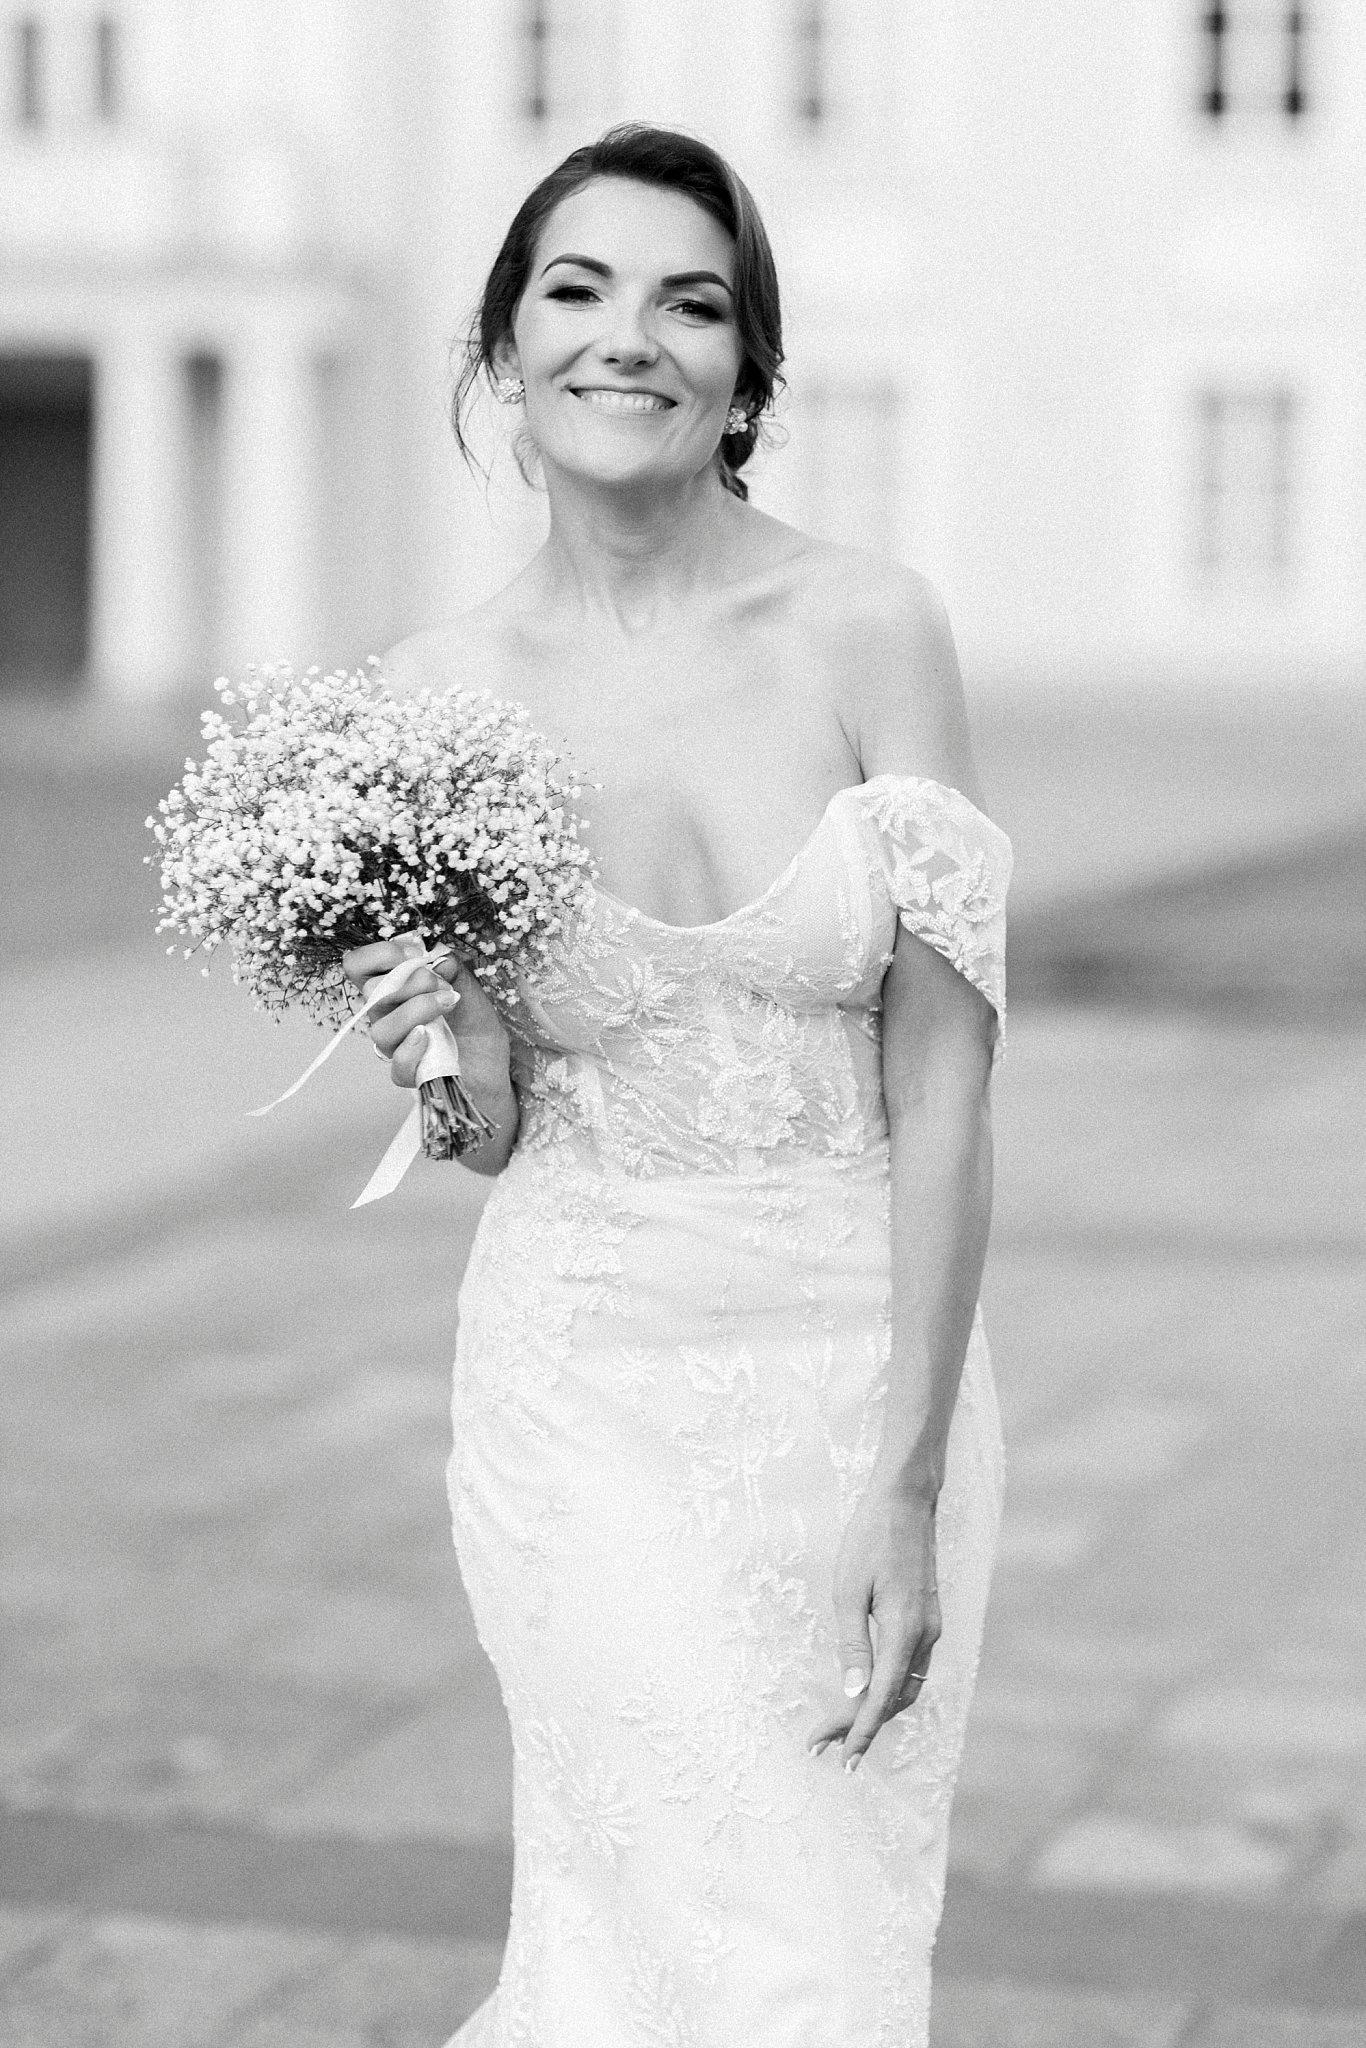 Portrait of bride in off-shoulder lace wedding gown - photo by Jurgita Lukos Photography